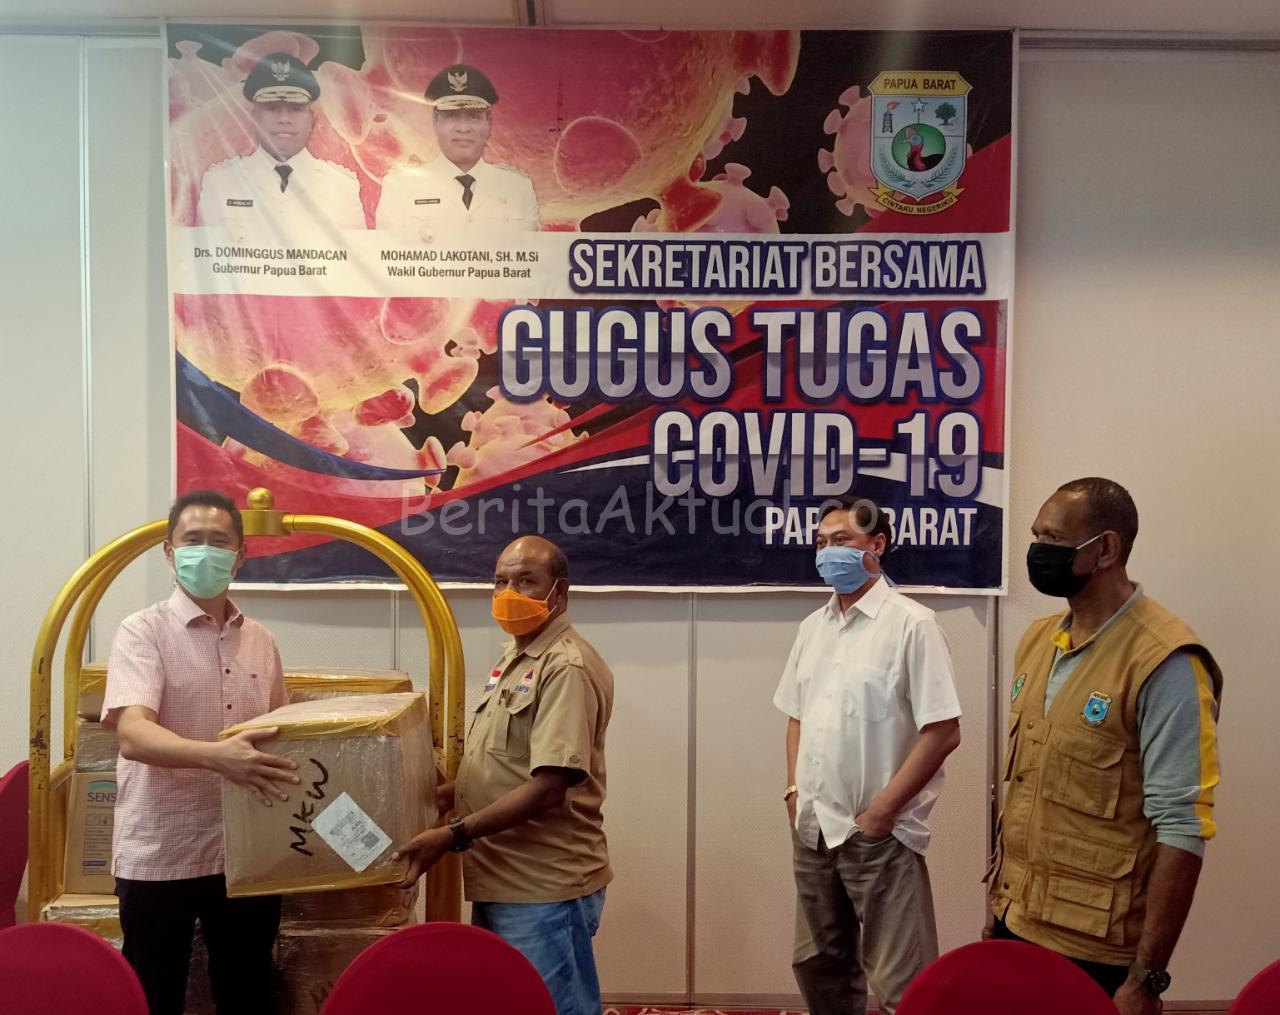 Gugus Tugas Covid-19 Papua Barat Dapat Bantuan Dari Petrotekno Bintuni 25 IMG 20200411 WA0044